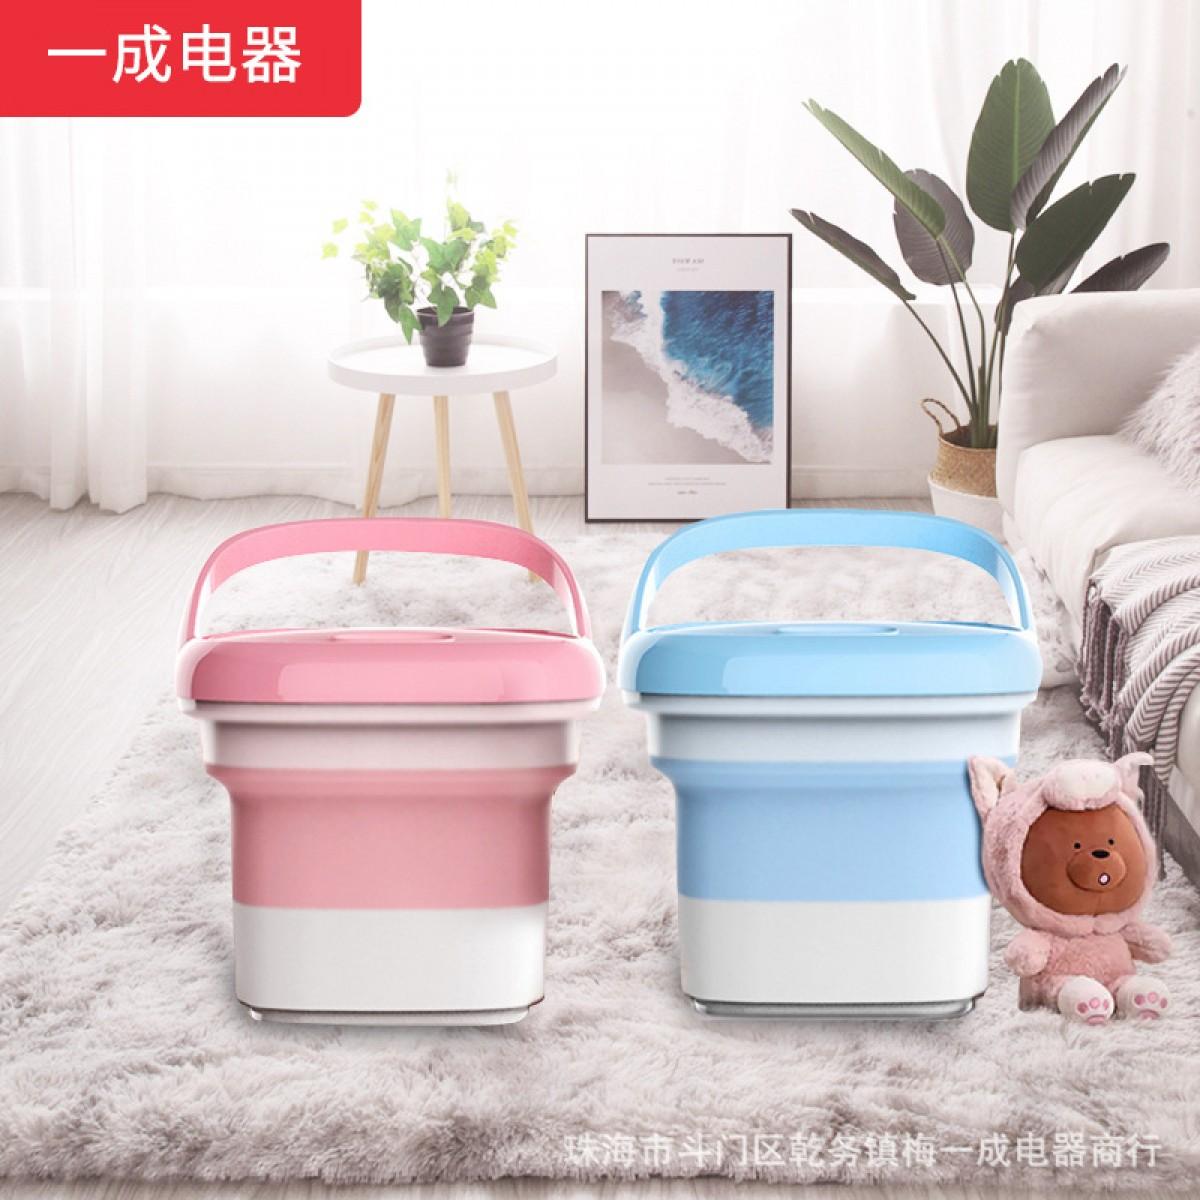 Mesin Cuci Lipat Mini Portable Otomatis Untuk Rumah - Bunda Ina Shop